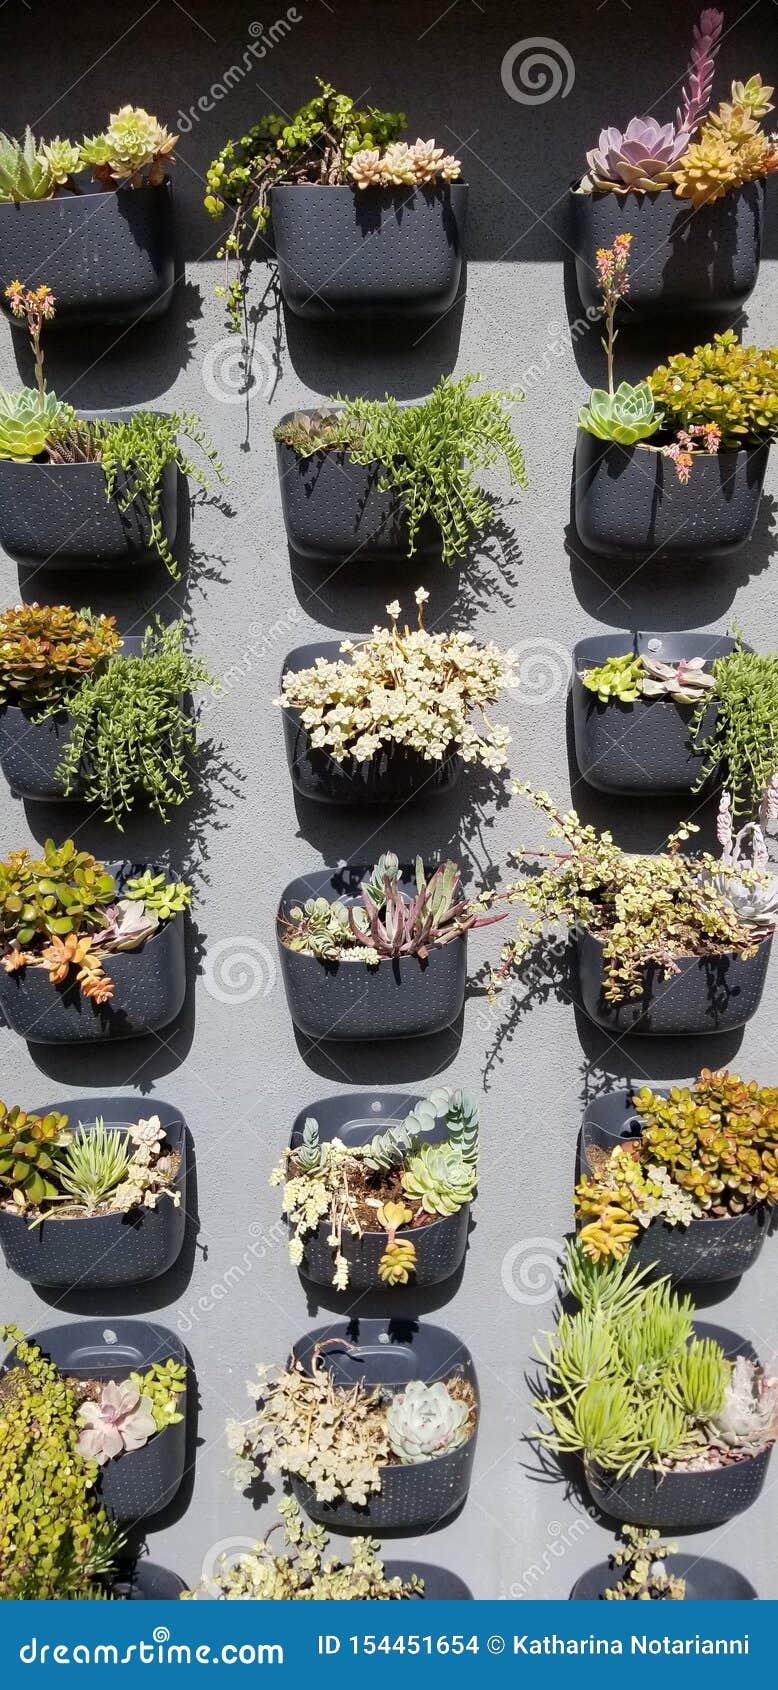 Succulent Wall Garden In Southern California Outdoor Shopping Center Stock Photo Image Of Table Center 154451654